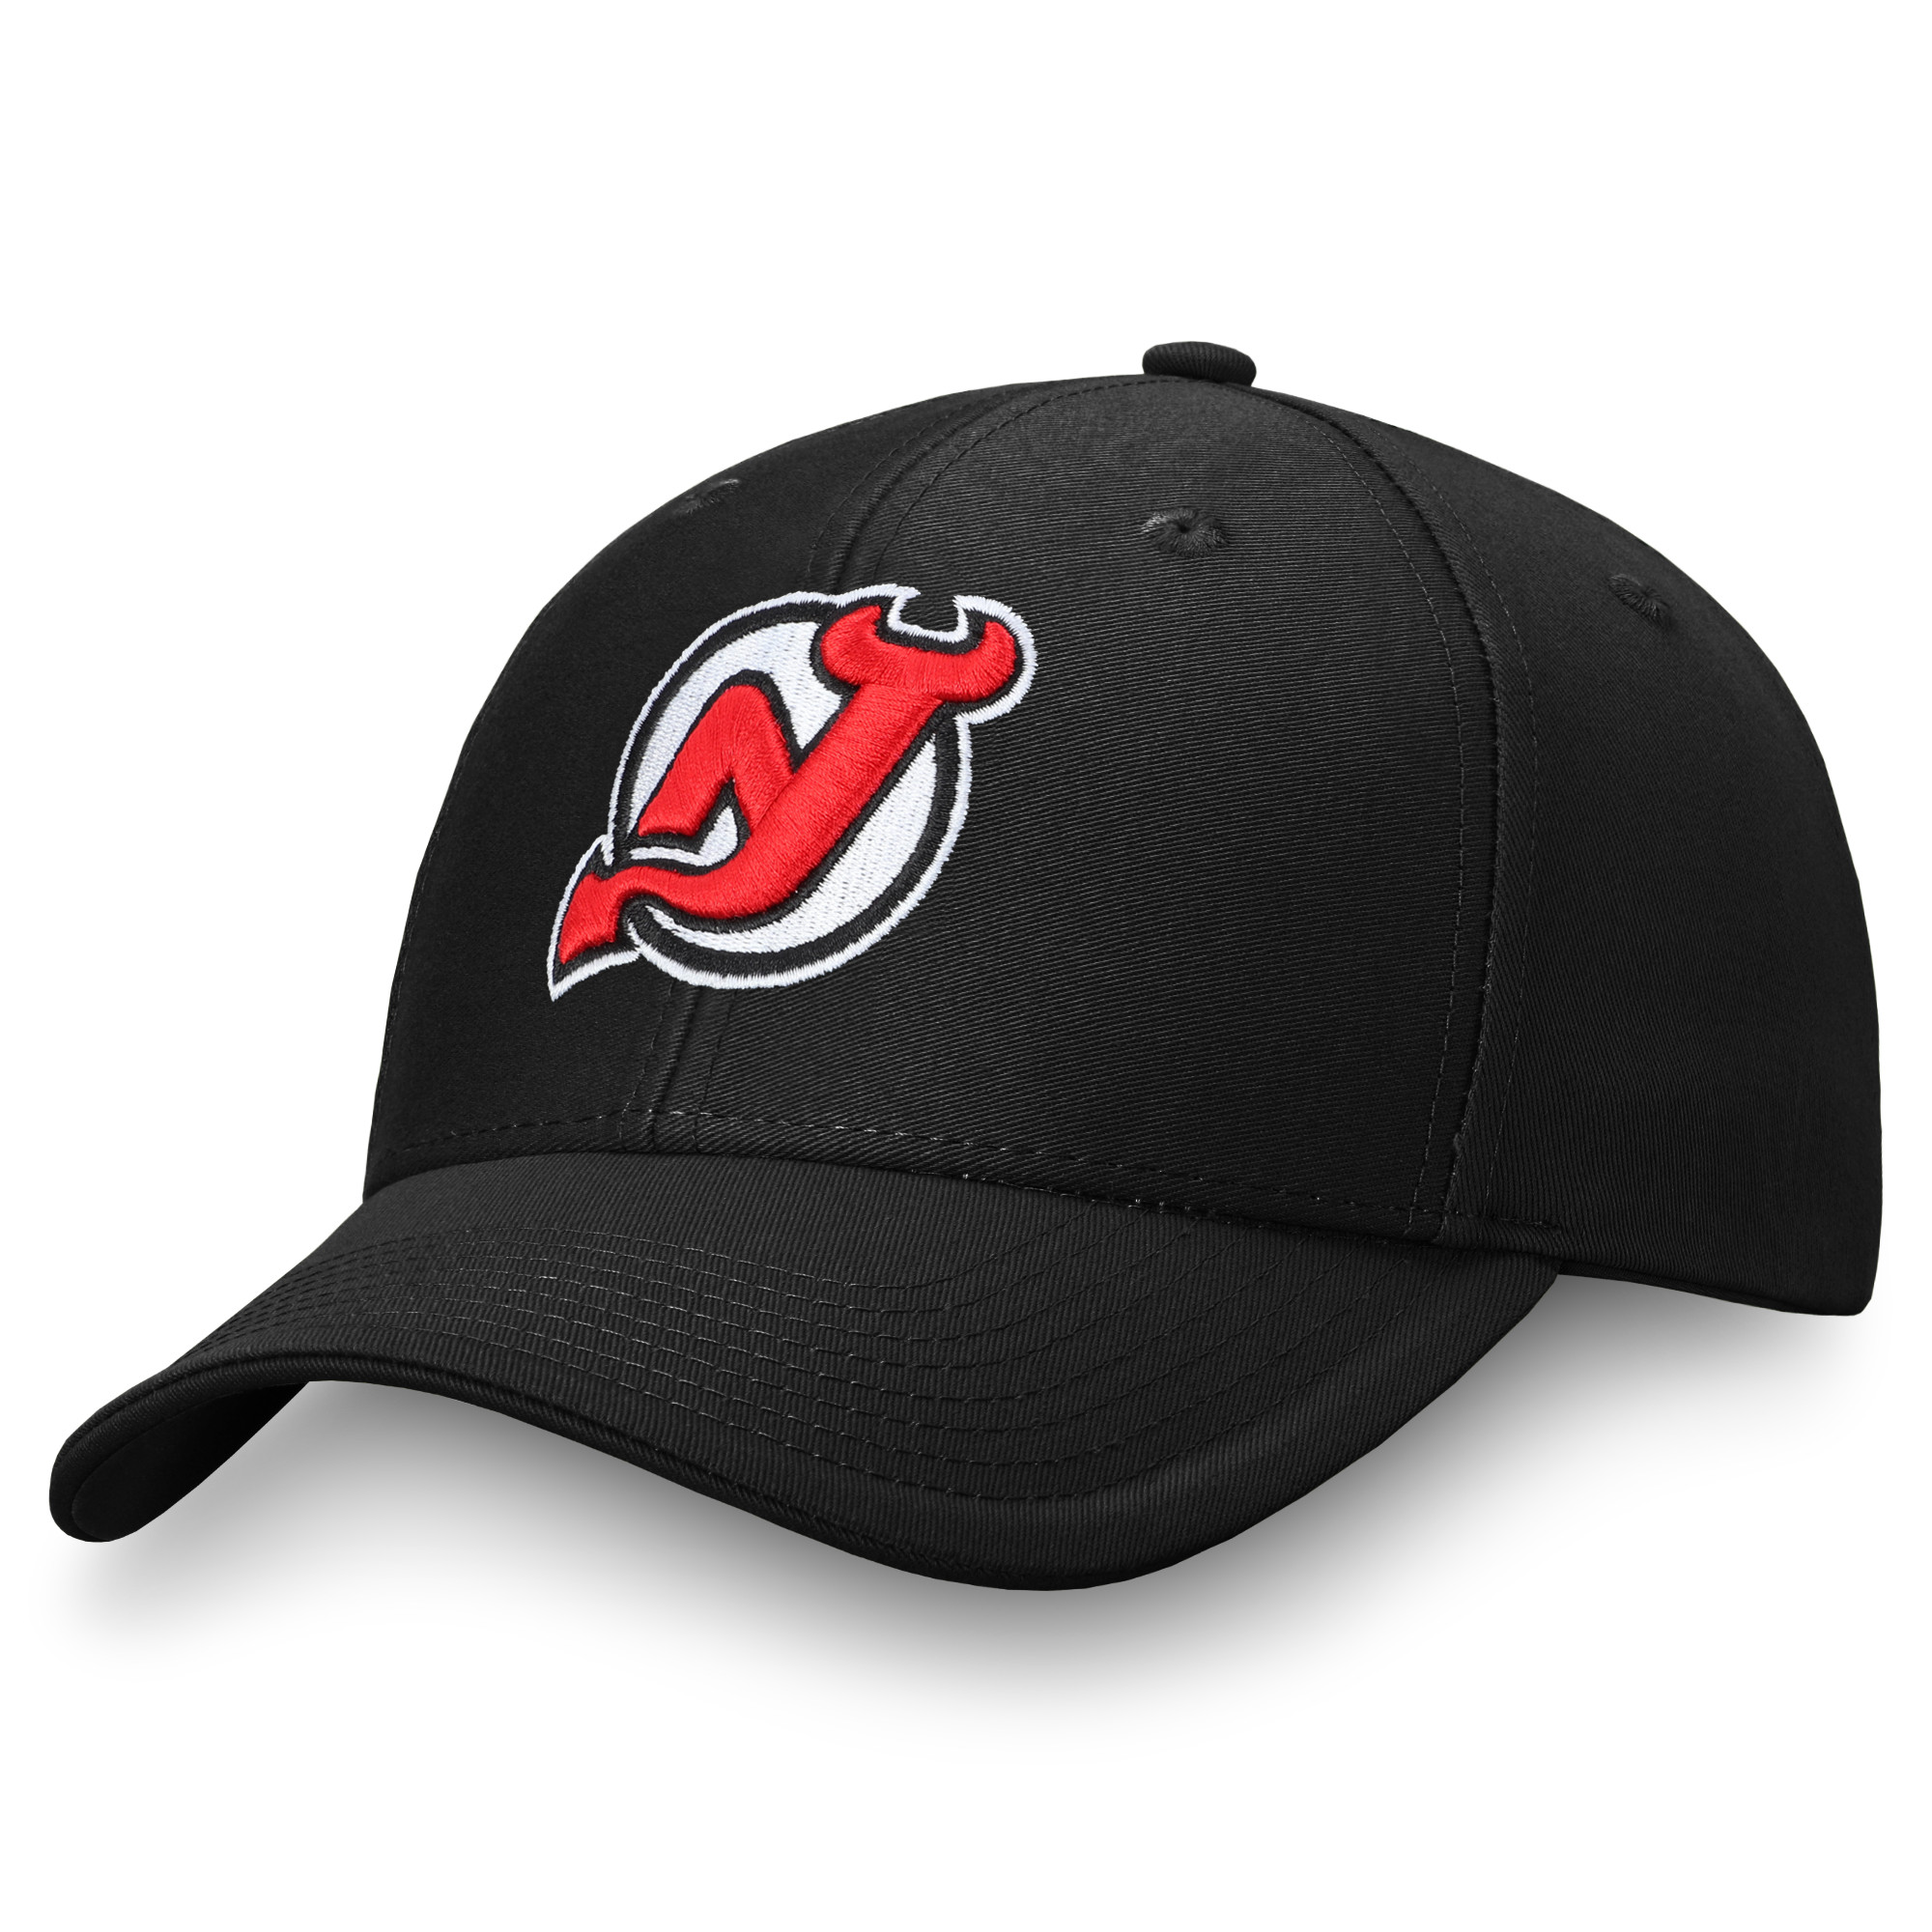 Men's Fanatics Branded Black New Jersey Devils Adjustable Hat - OSFA